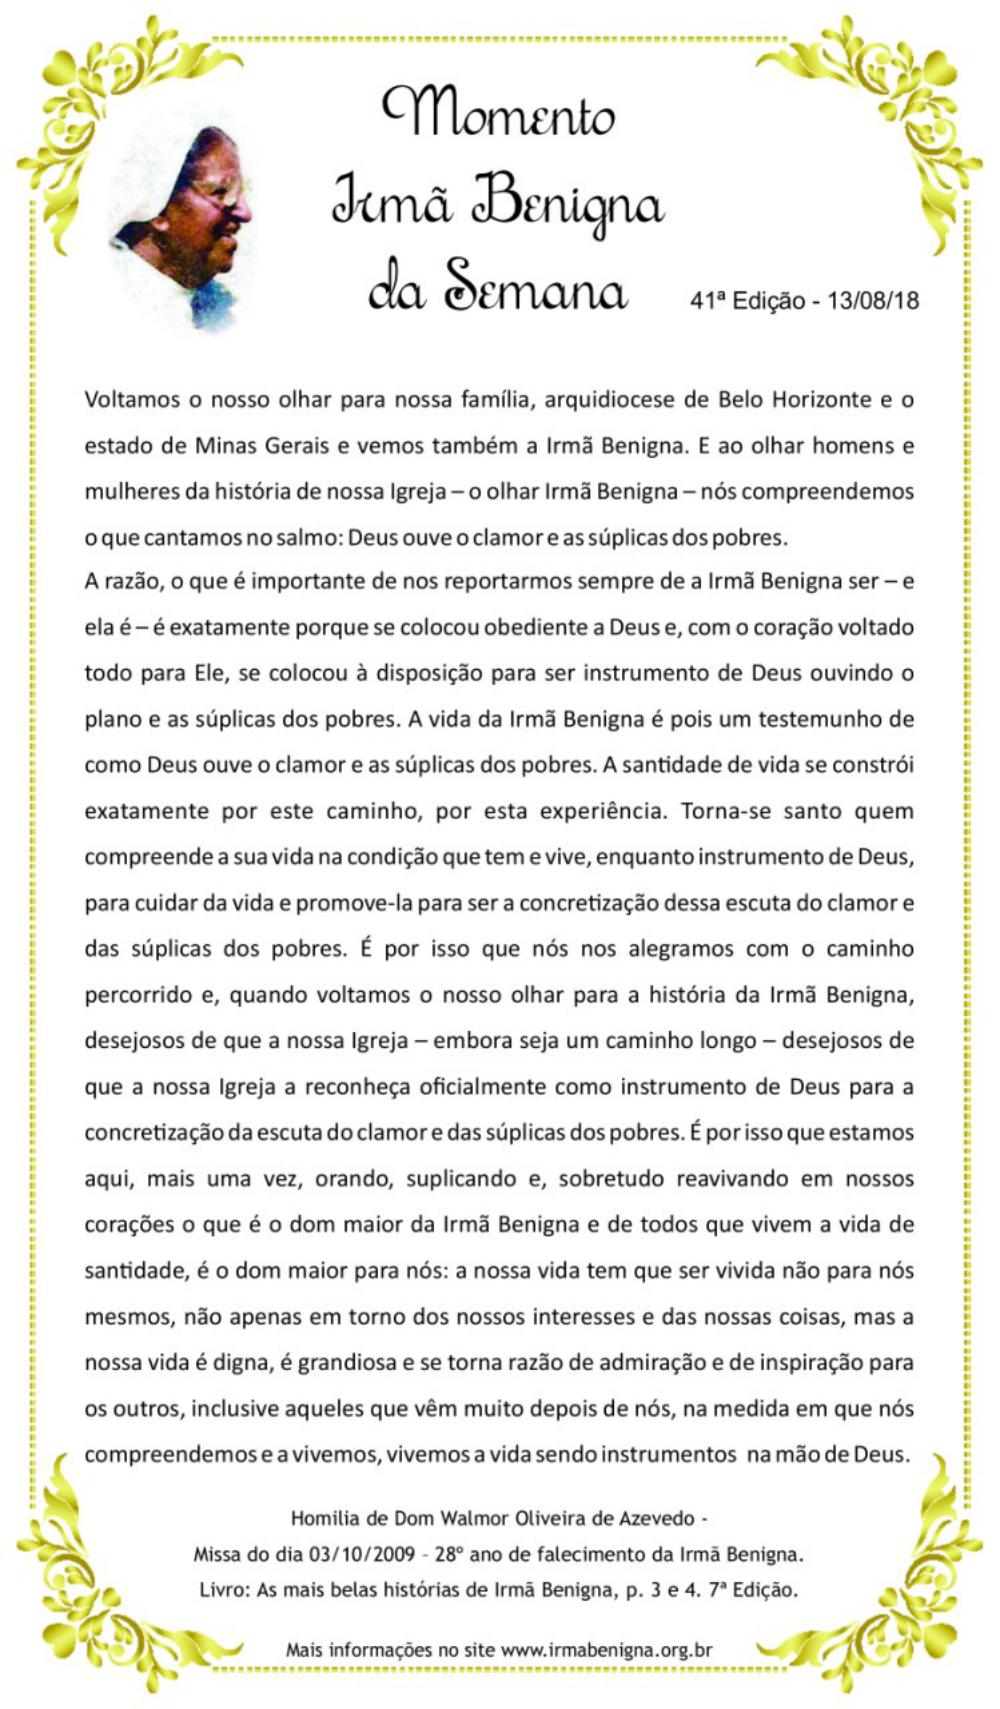 4c1e20e05 Momento Irmã Benigna da Semana - 40ª semana